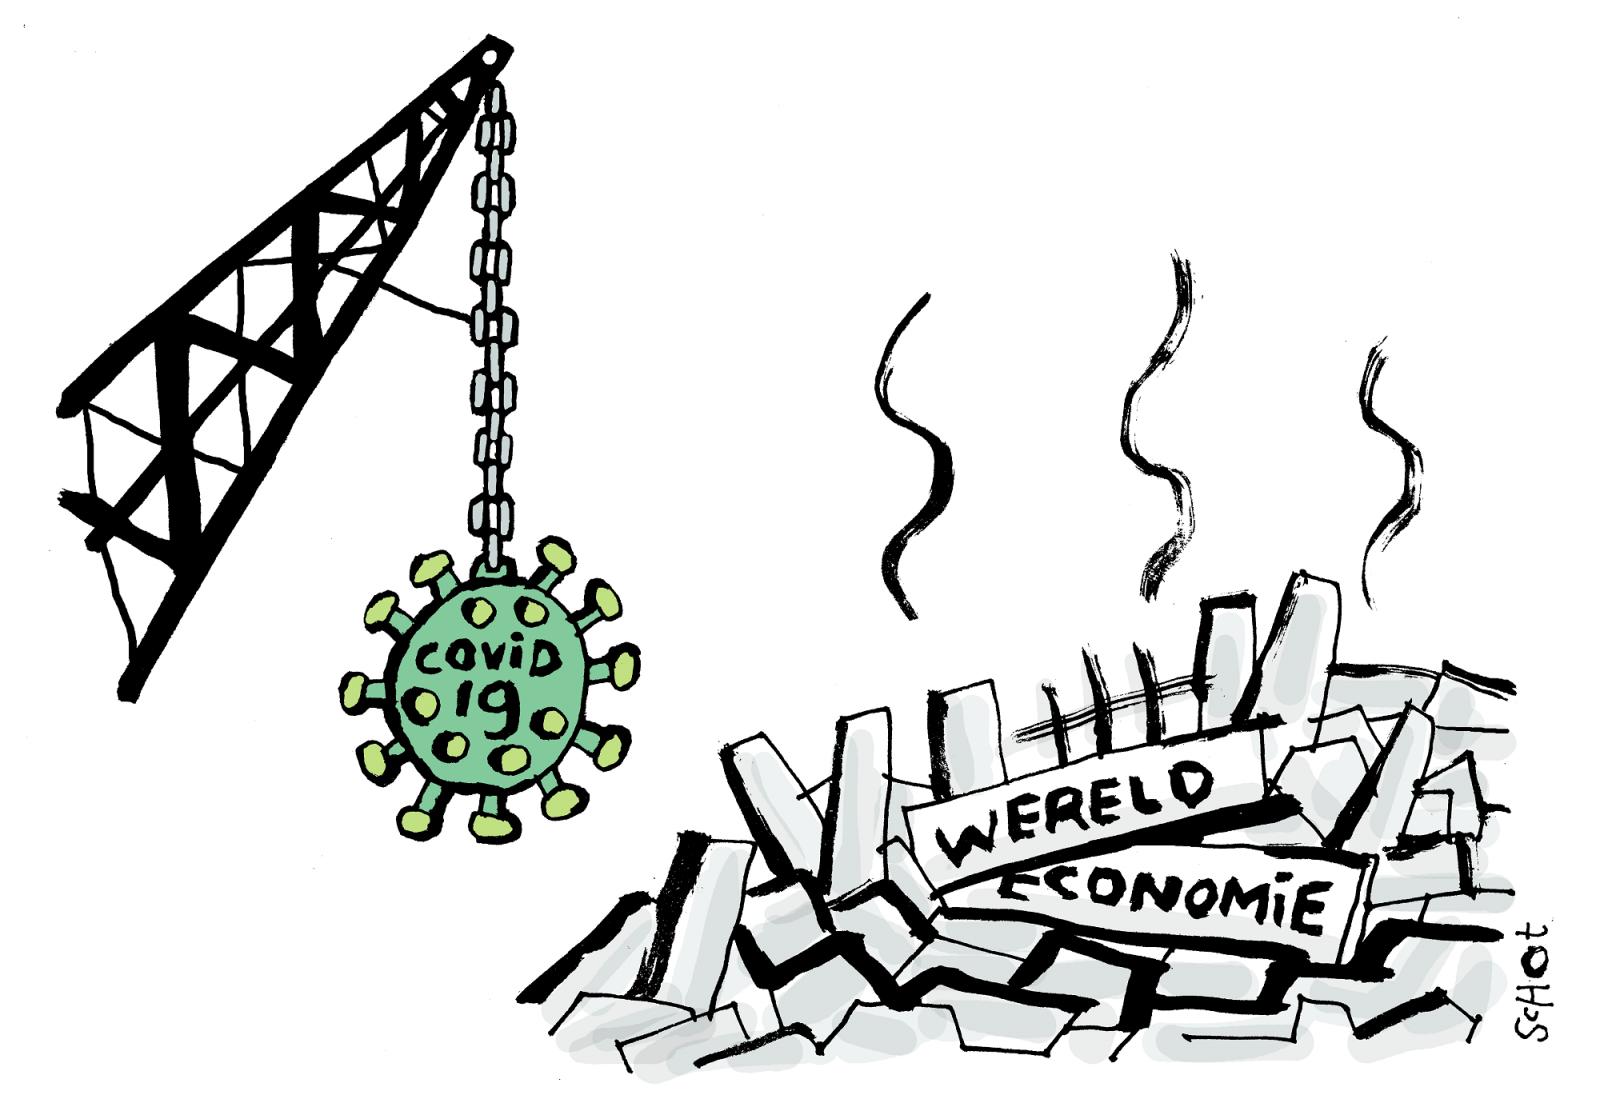 Bas_economie_corona_3